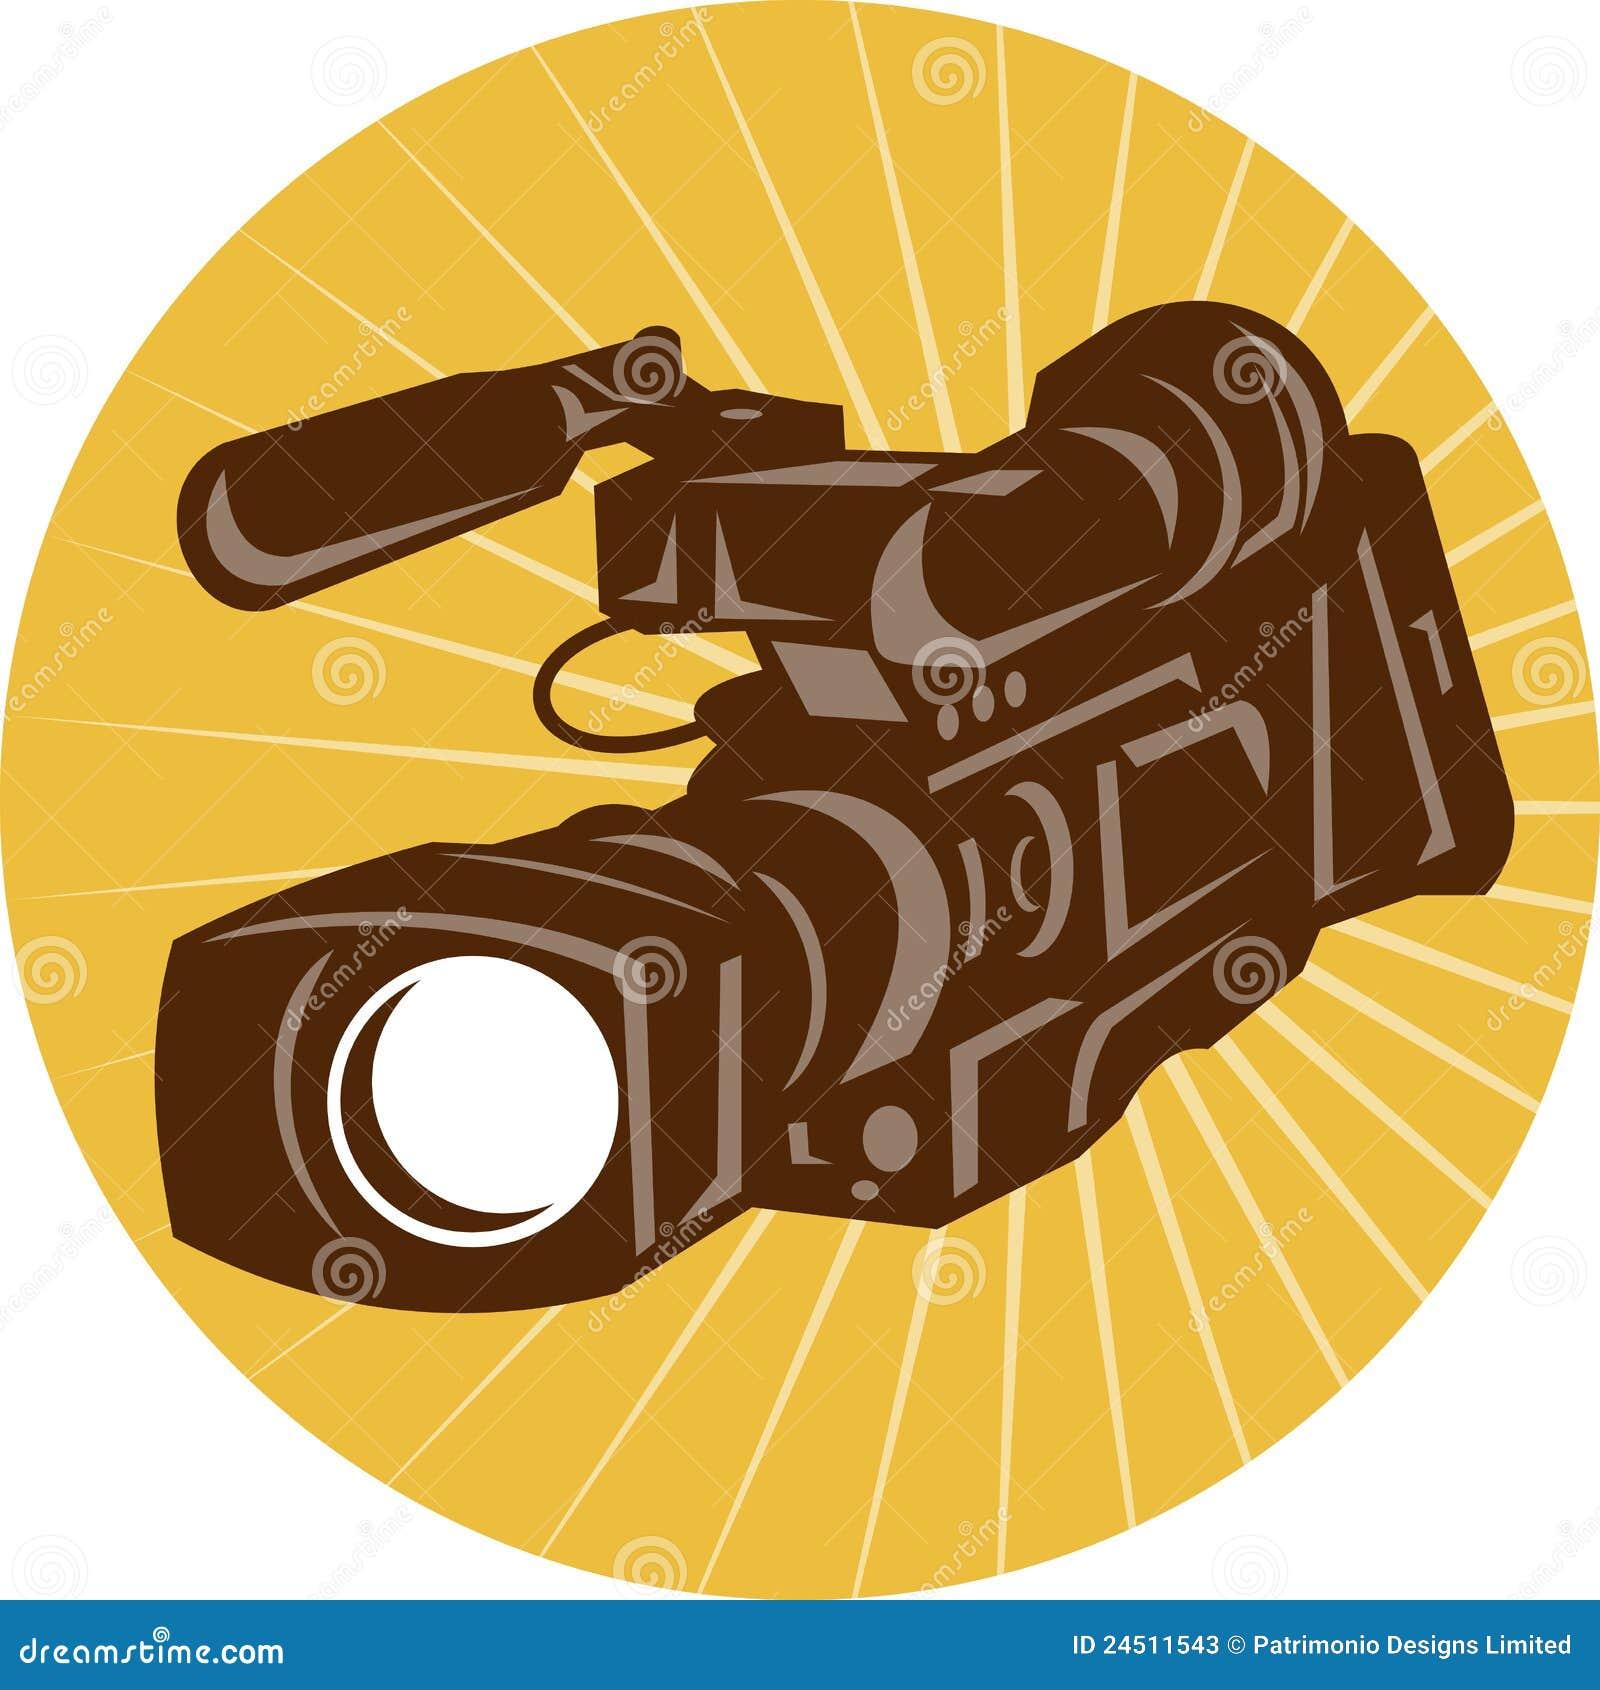 download professional video camera camcorder retro stock vector illustration of movie circle 24511543